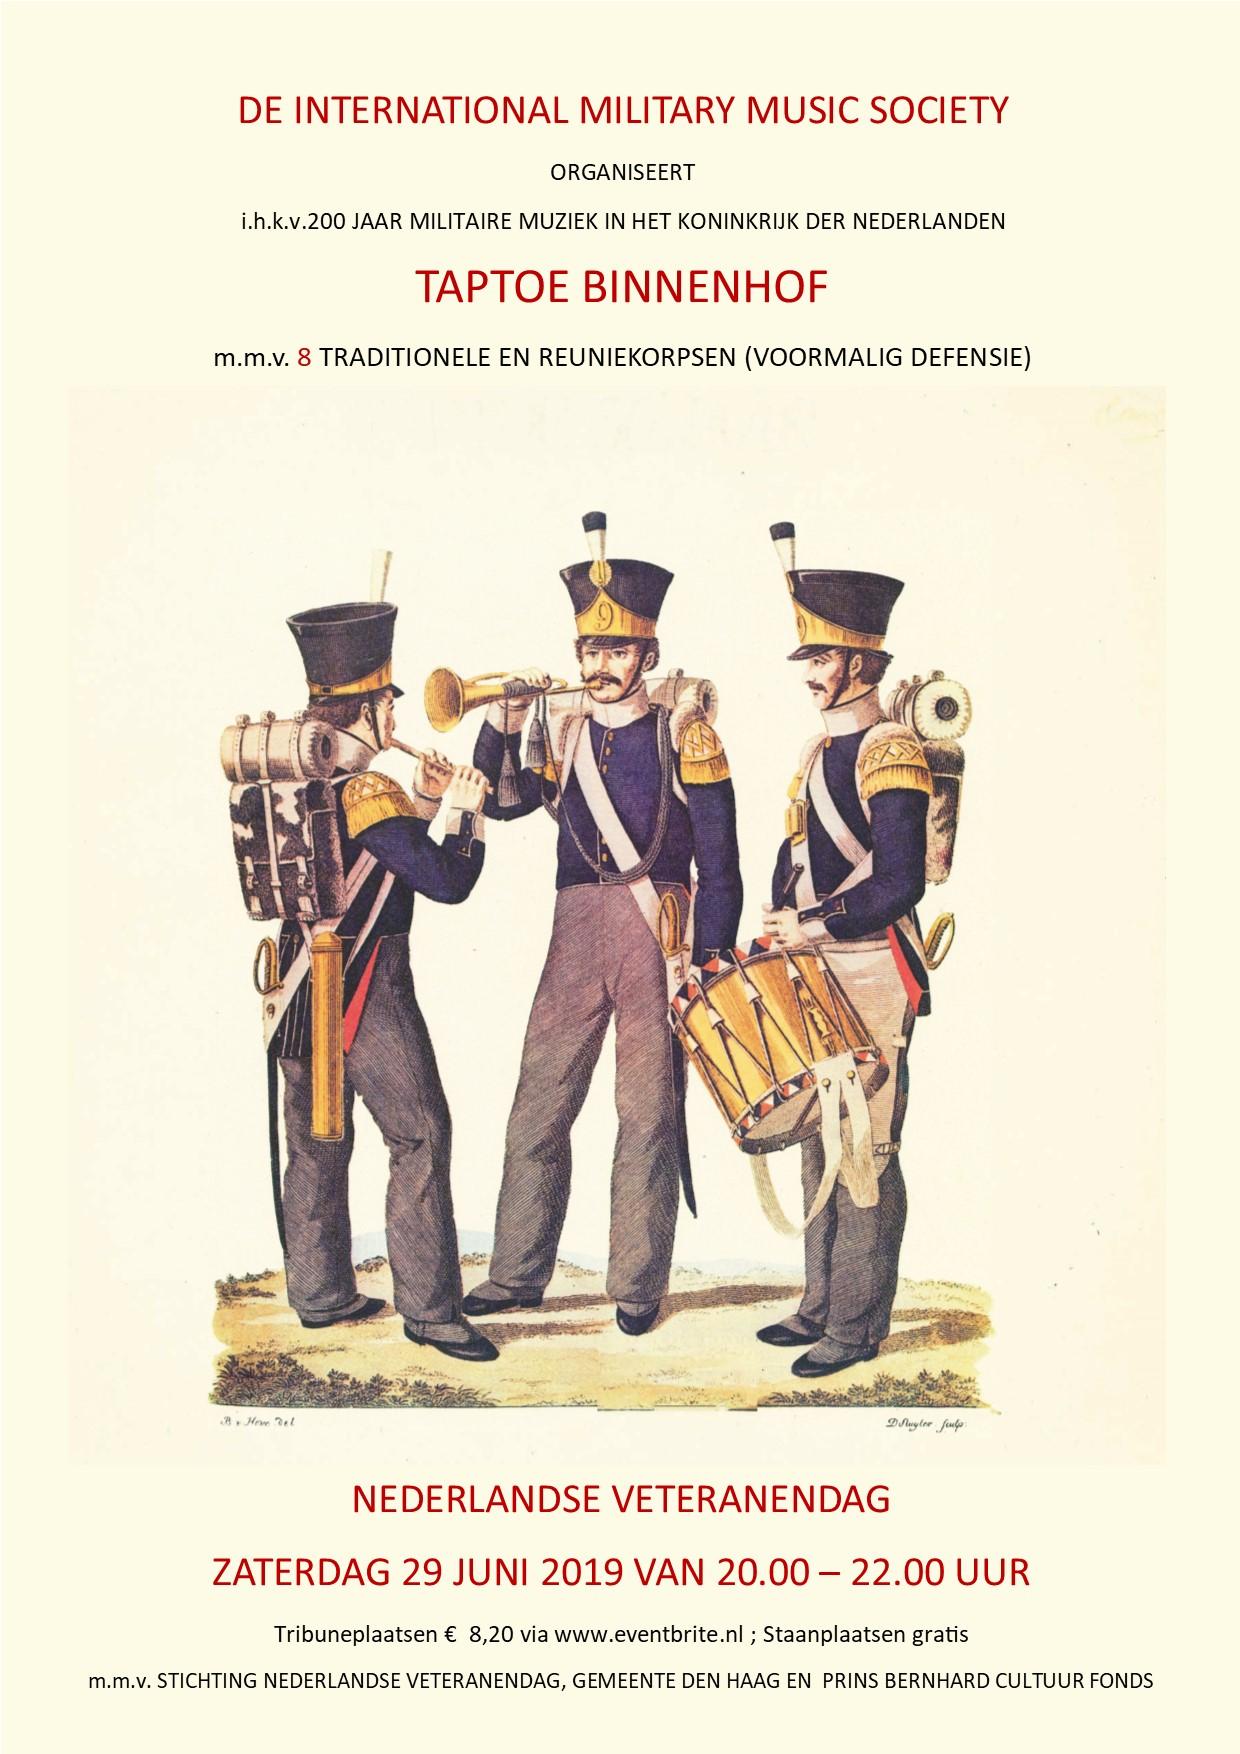 Taptoe Binnenhof Den Haag 7 juni - 29 juni